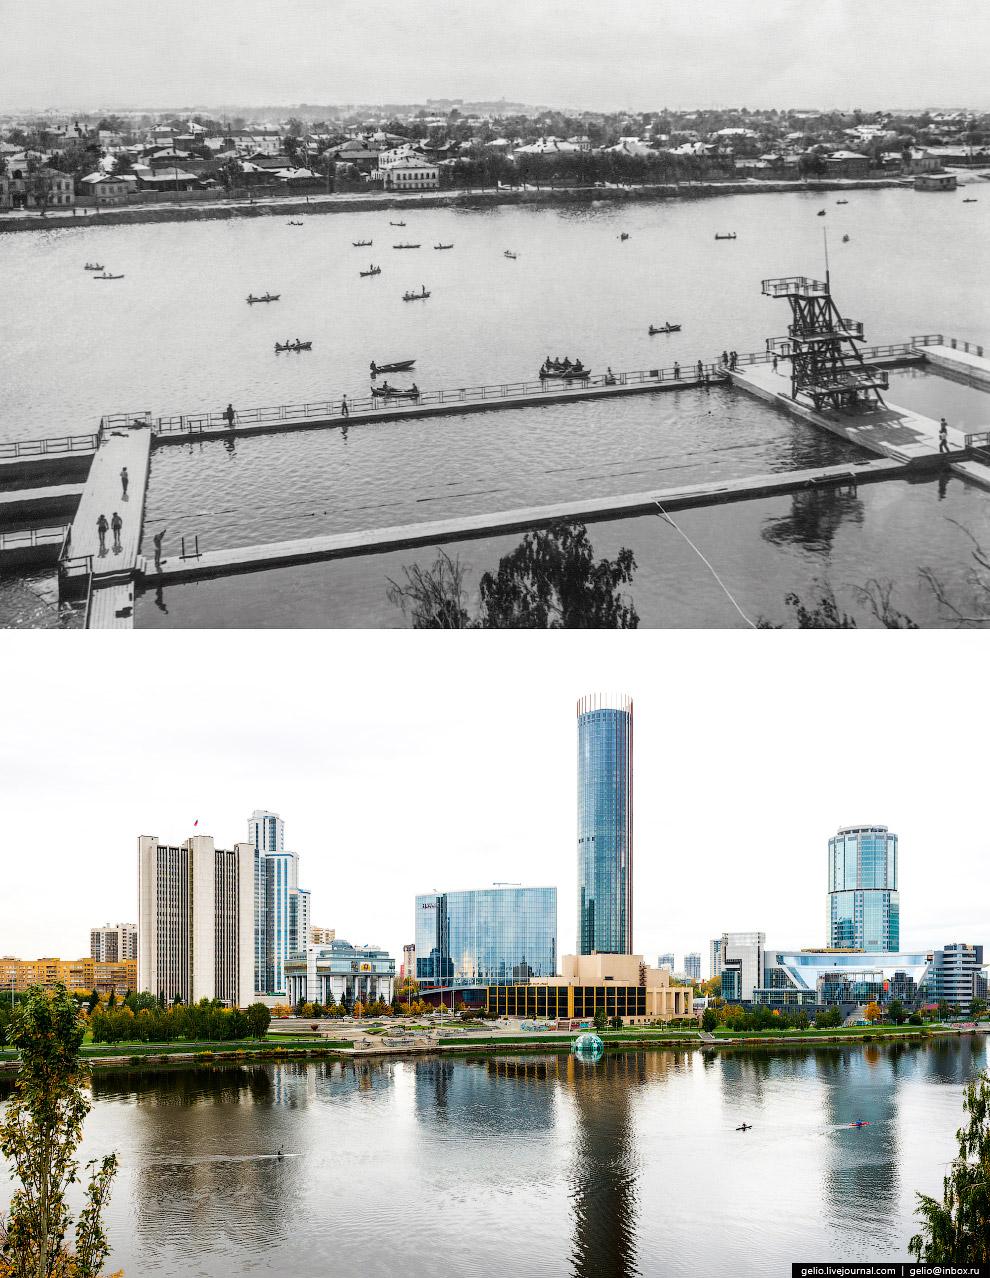 Екатеринбург-Сити